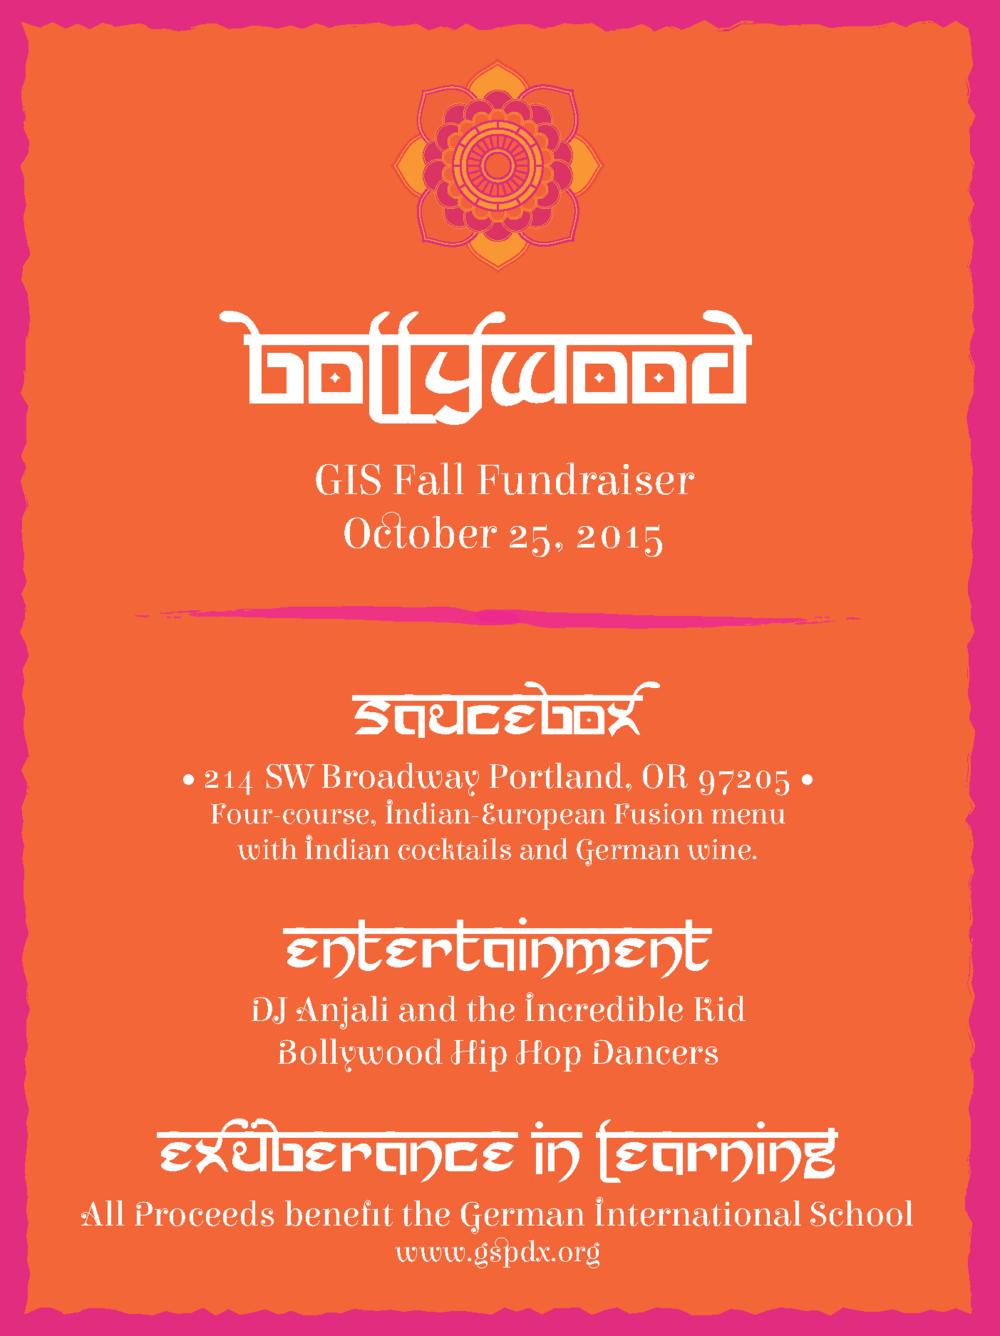 Bollywood Fundraiser Invitation_Front